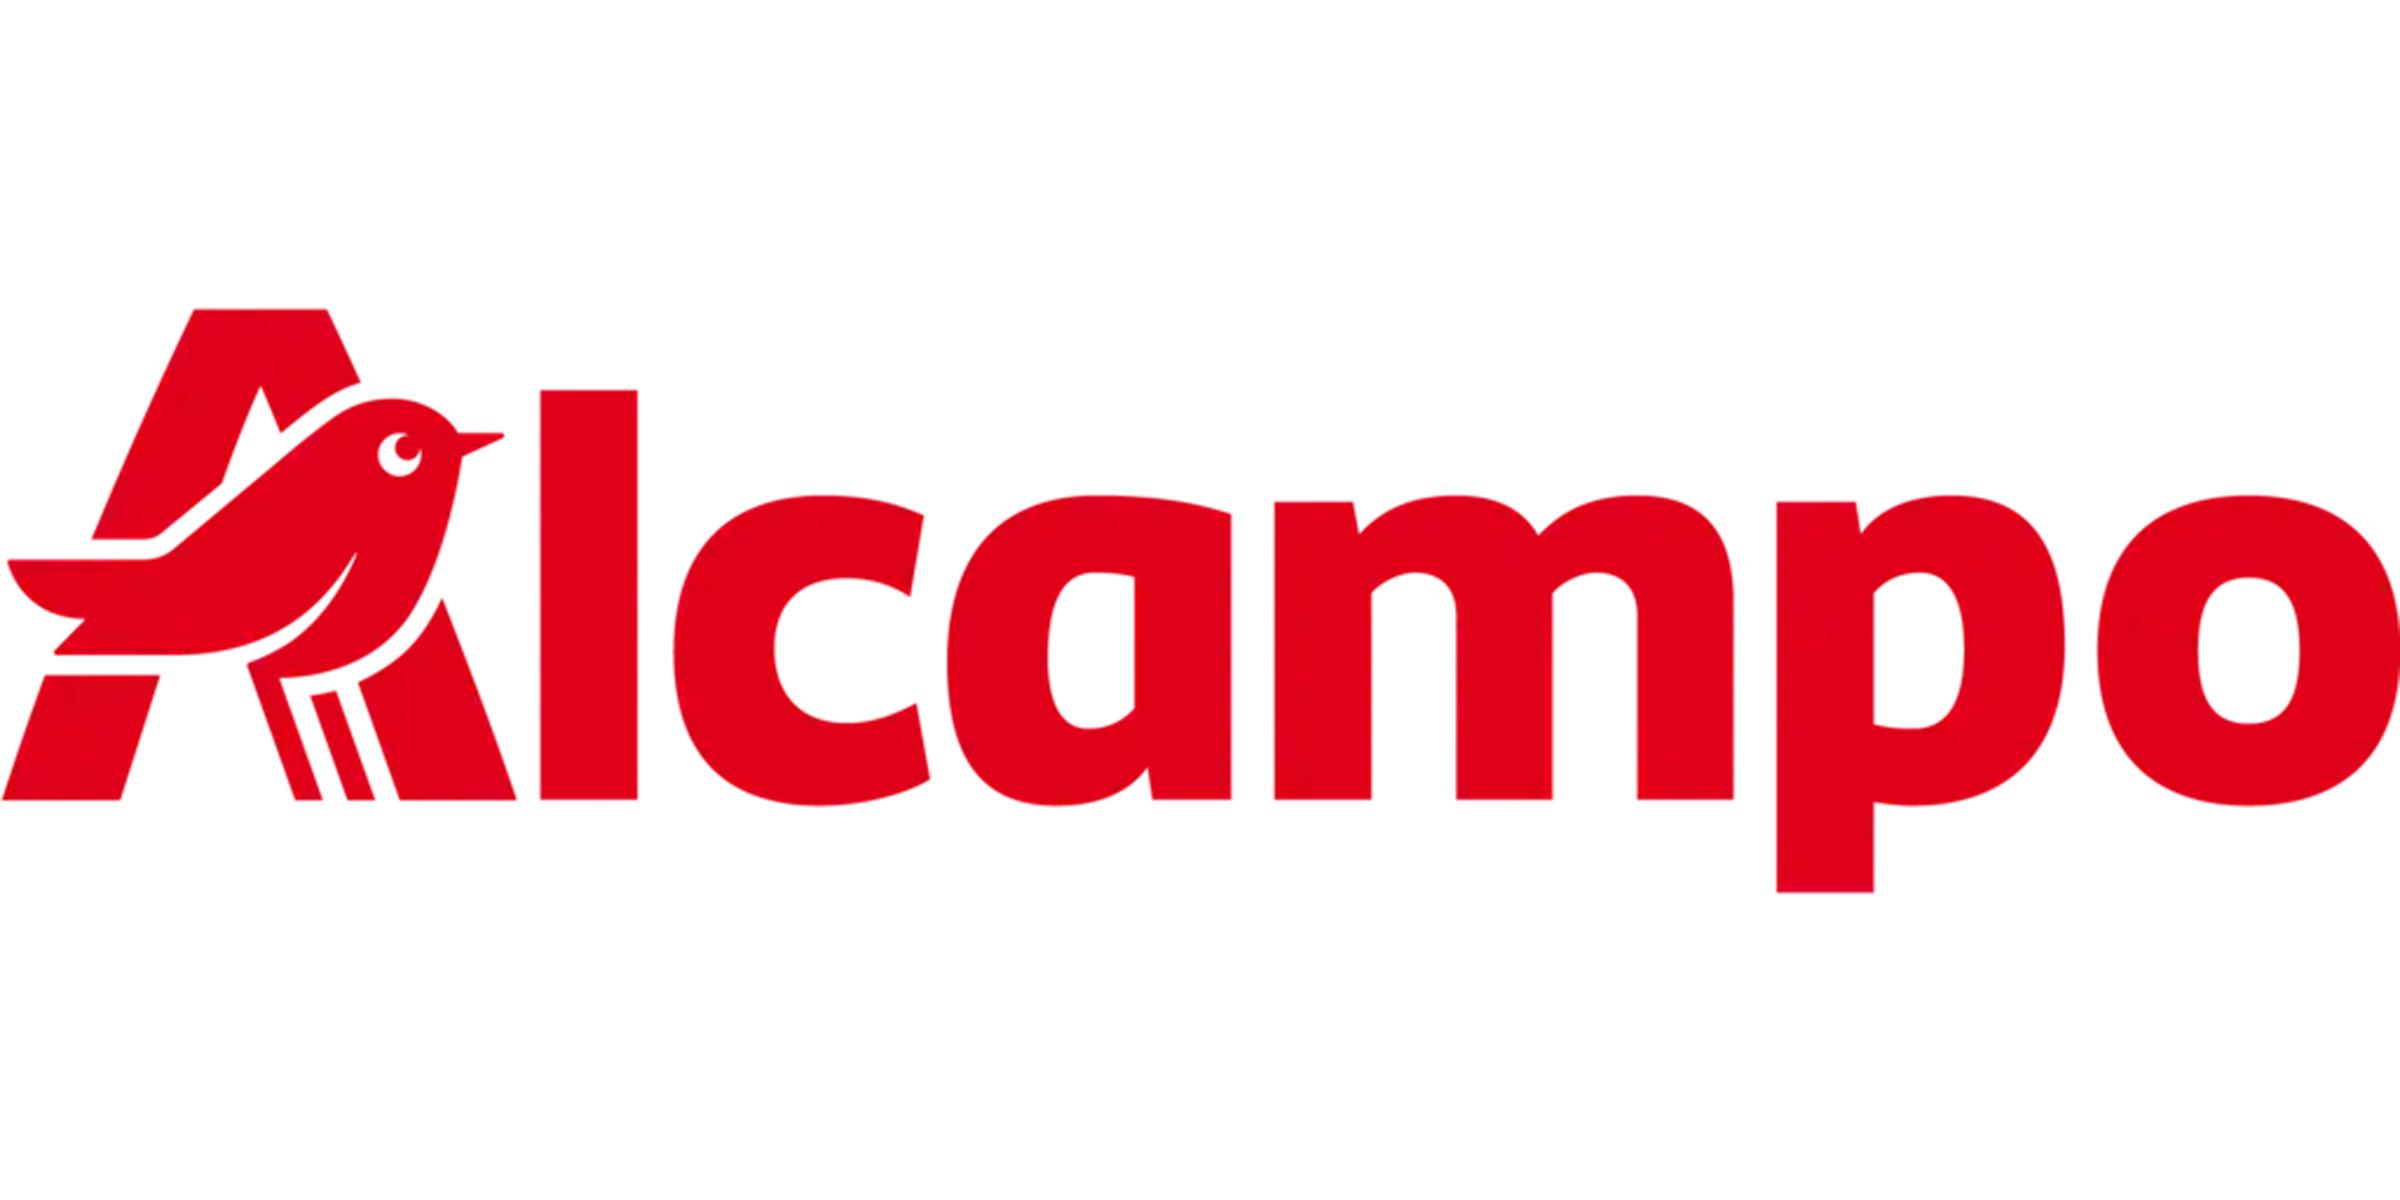 https://www.alcampo.es/compra-online/tecnologia/telefonia/c/W93